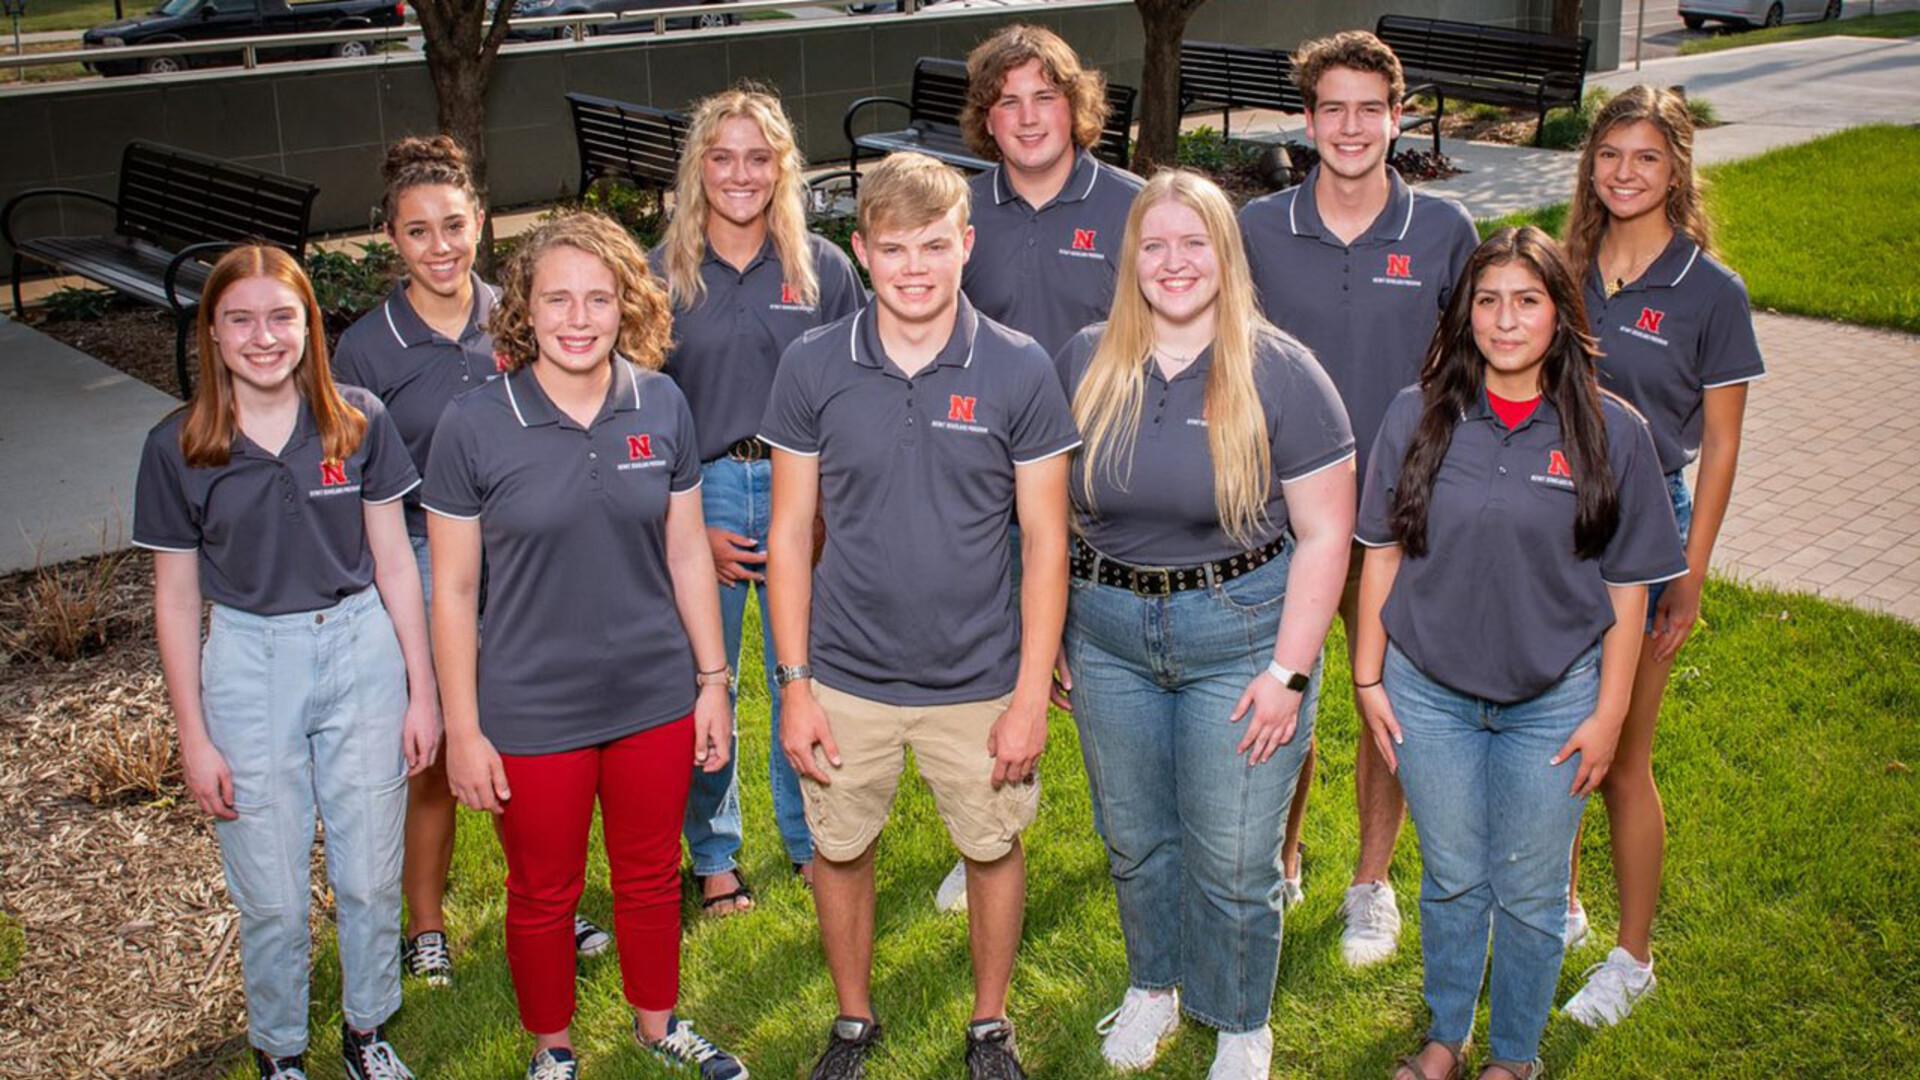 Engineering announces Kiewit Scholars Program, inaugural cohort